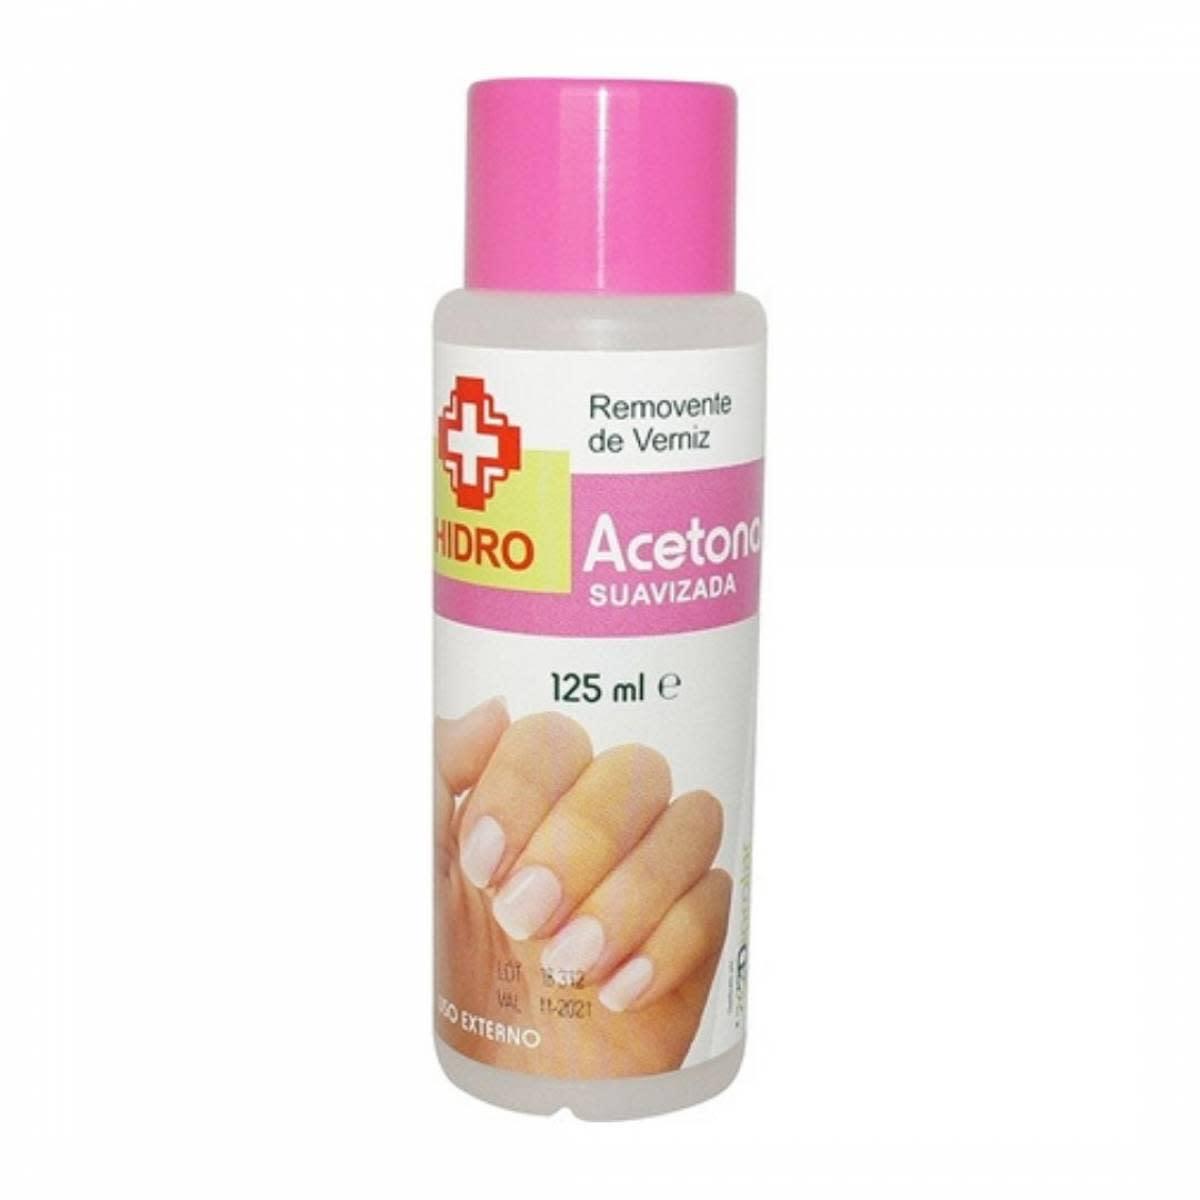 Acetona Hidro 125 Ml